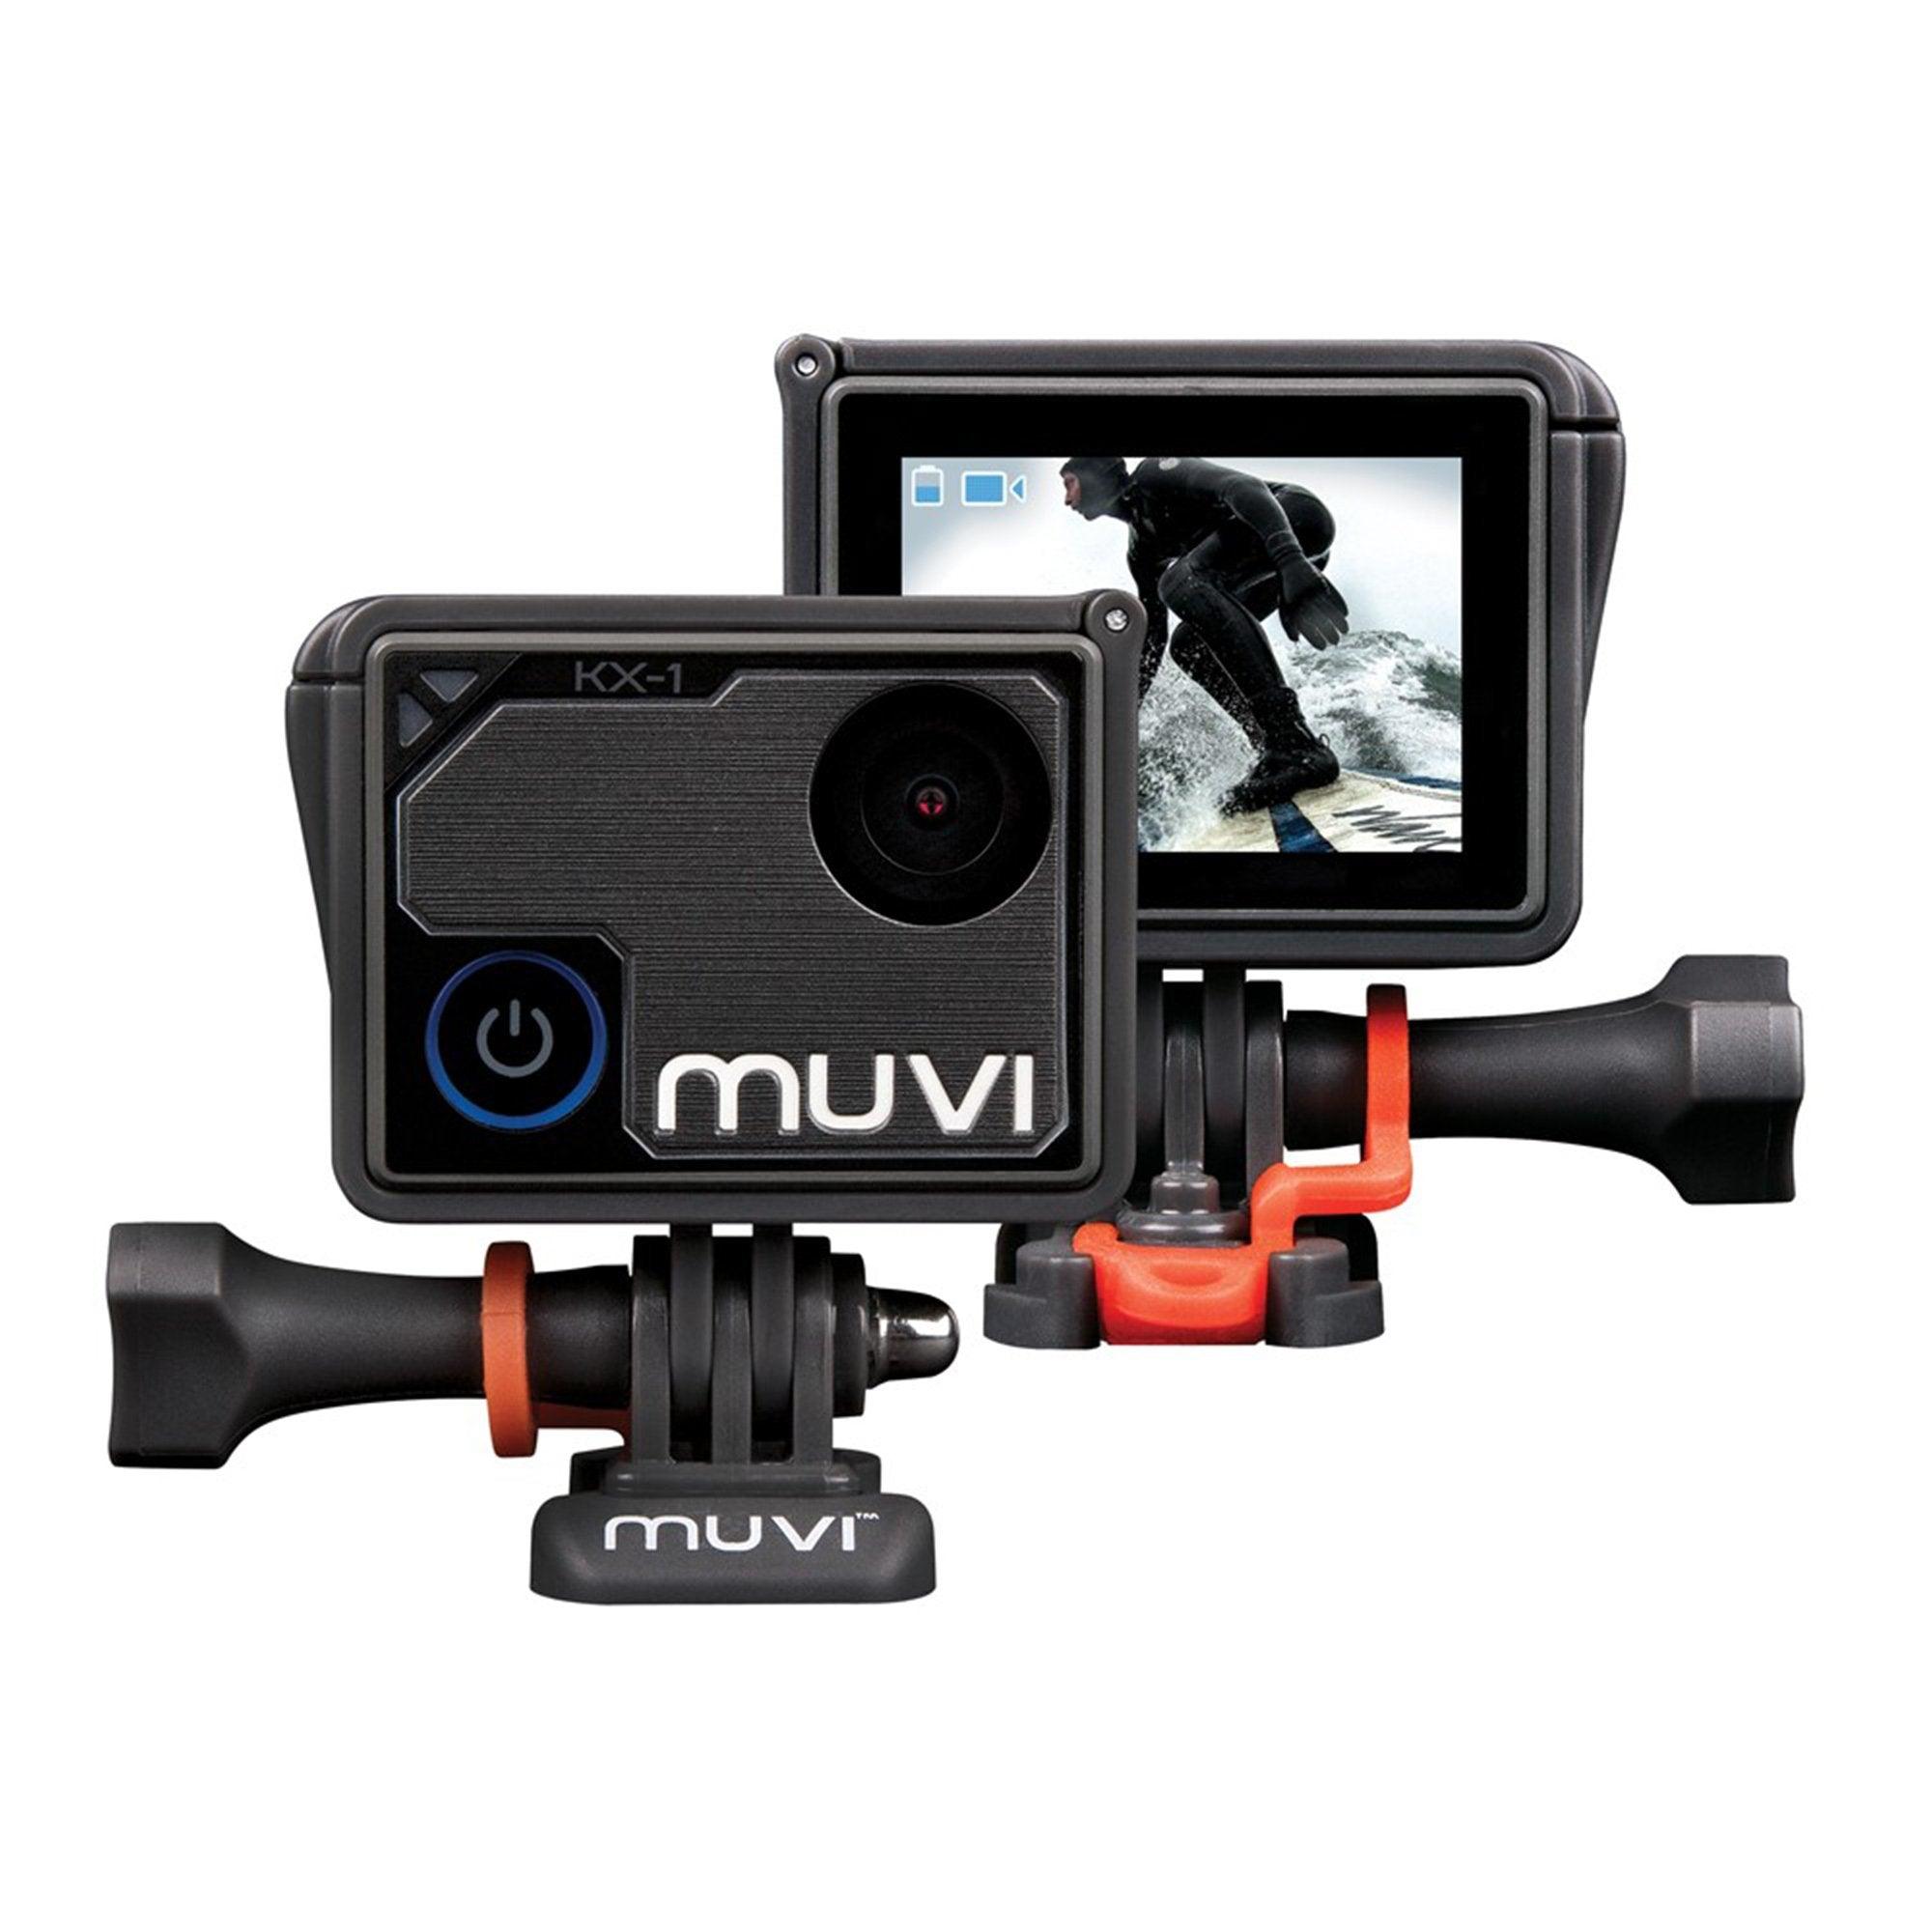 Bluemar Promotions Veho Muvi KX-1 Handsfree 4k Action Camera w/ 12MP Lens in Black